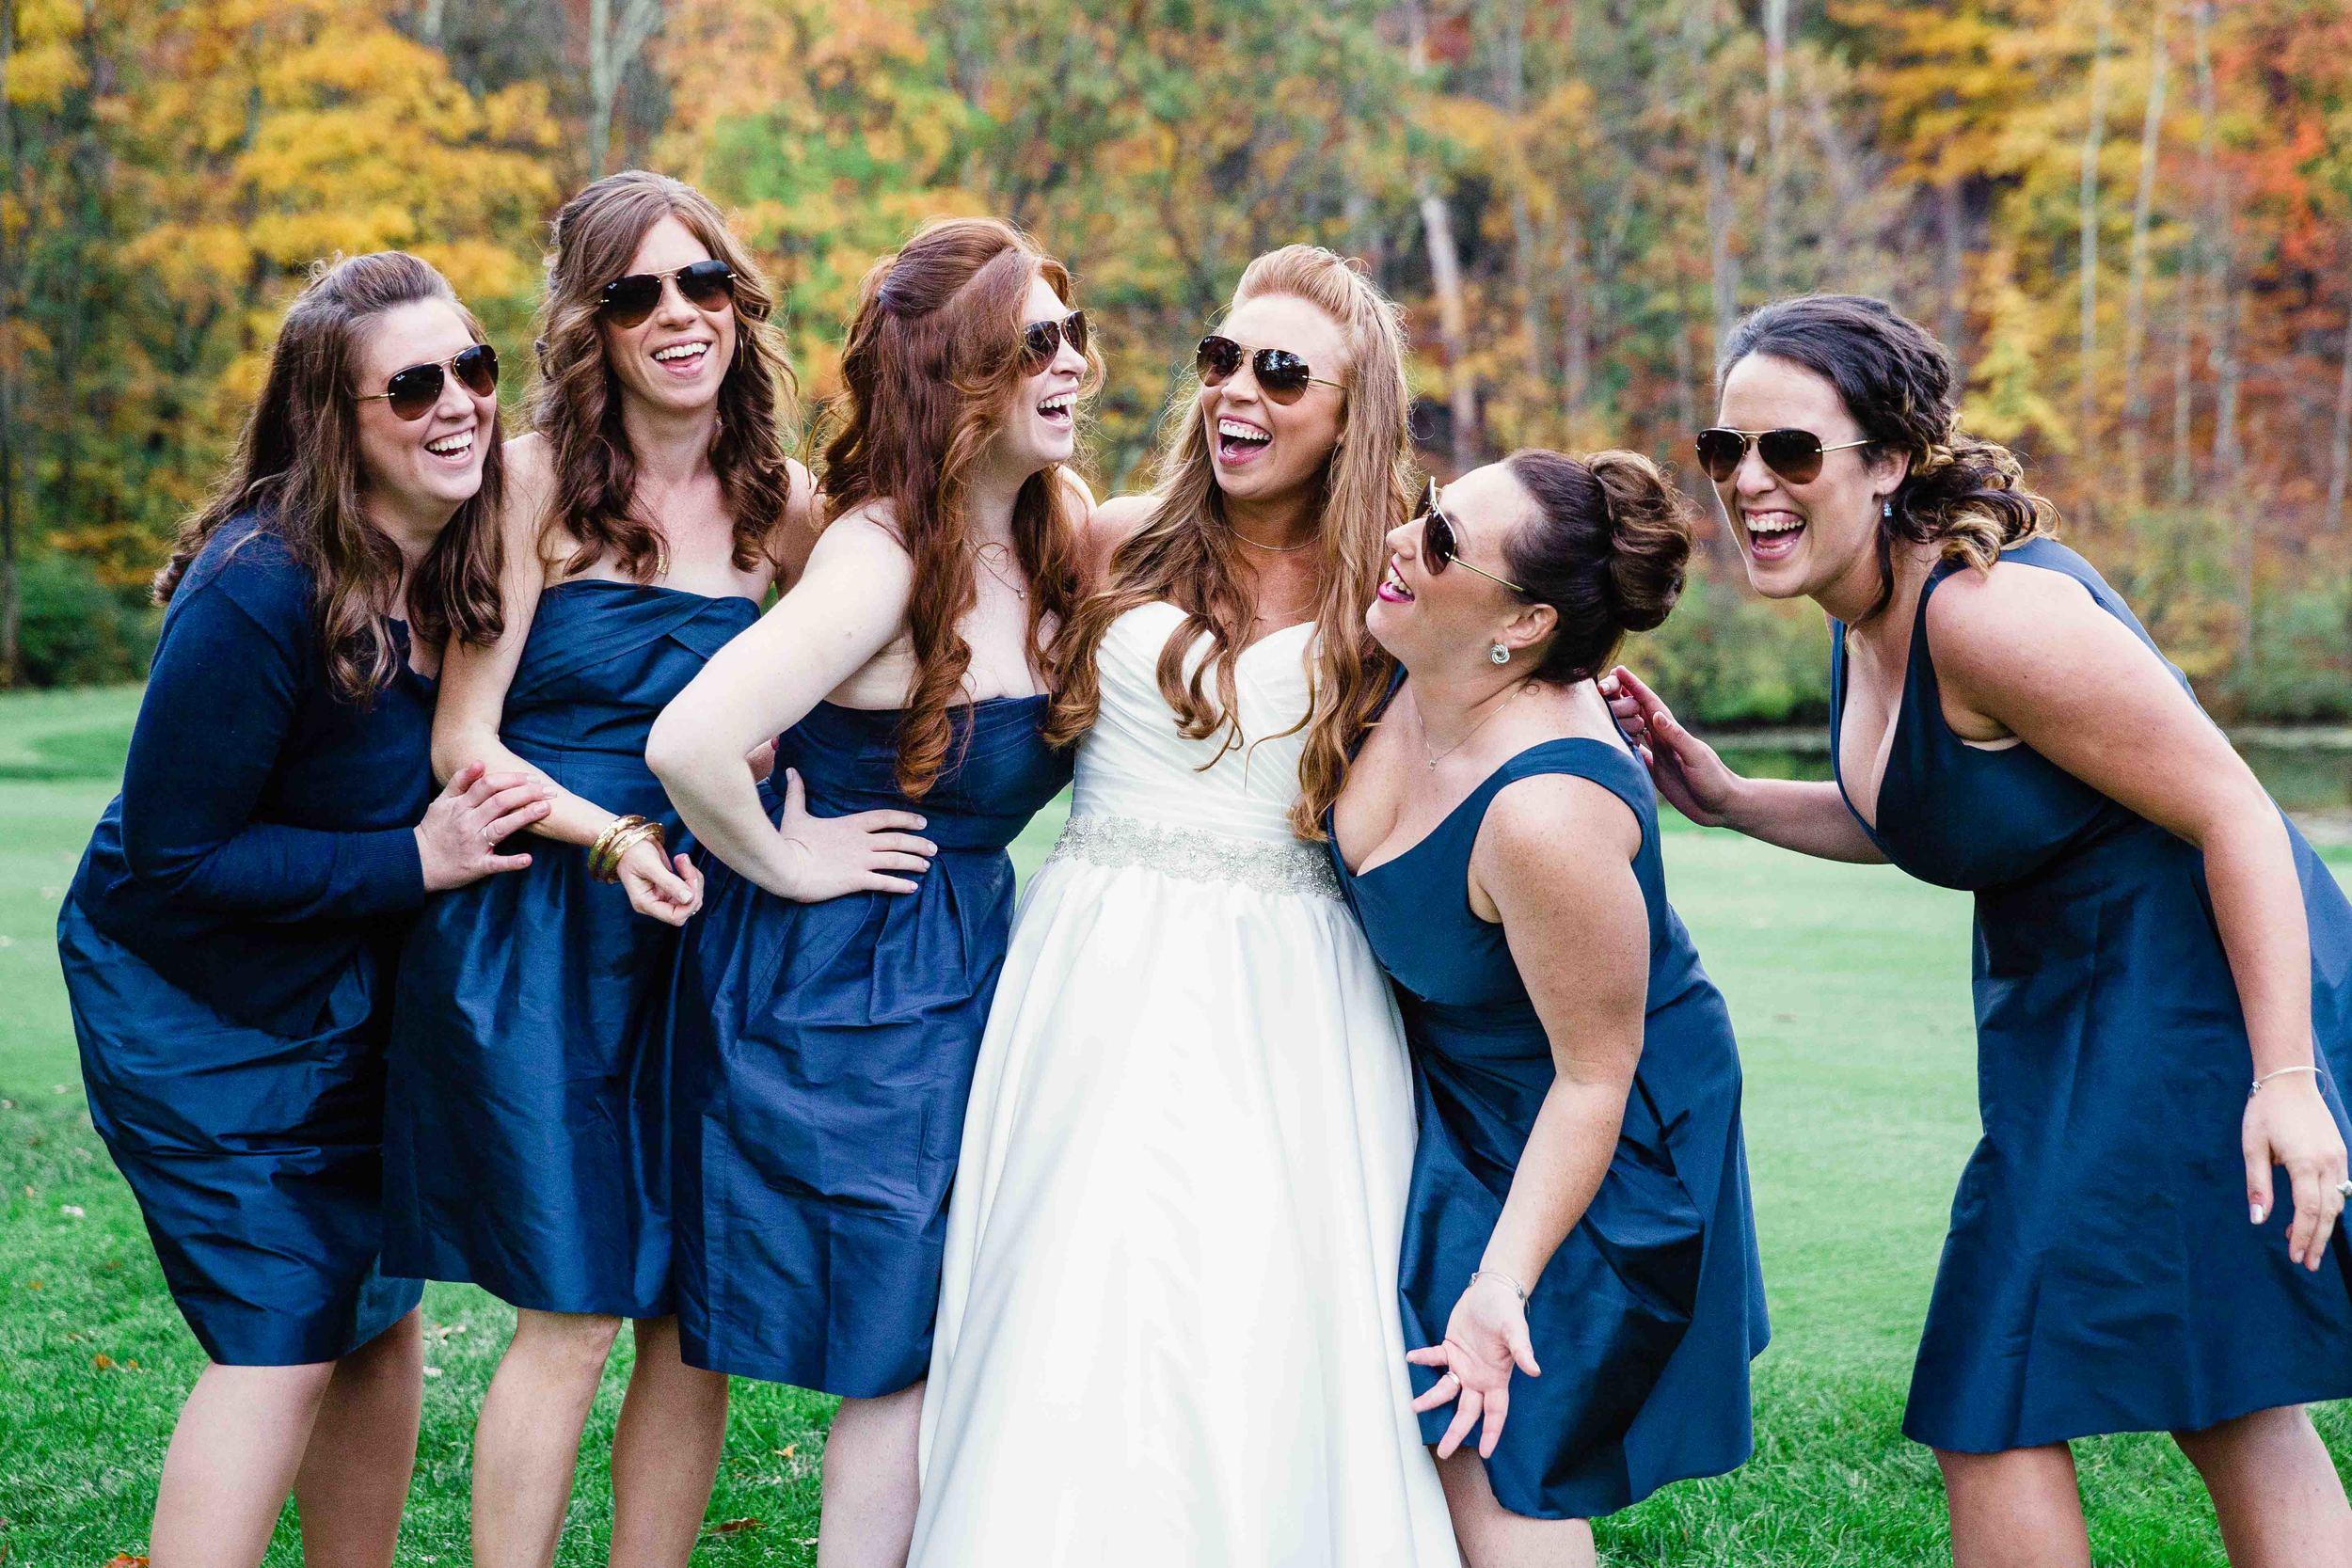 Connecticut-Fall-Wedding-Shuttle-Meadow-Country-Club-CT-Documentary-Wedding-Photographer-Jacek-Dolata-13.jpg